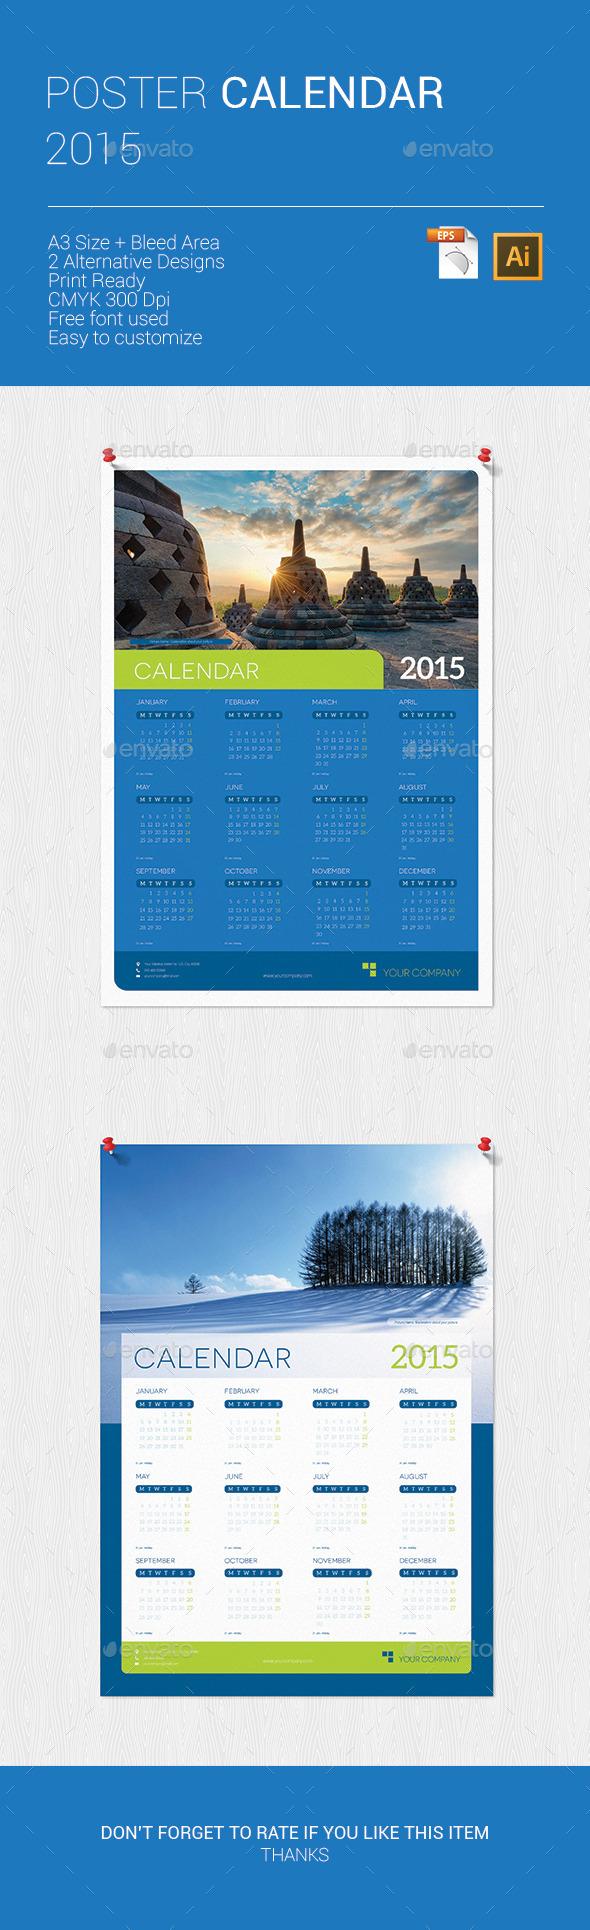 Credit Card Size Calendar Free Template 2015 » Tinkytyler